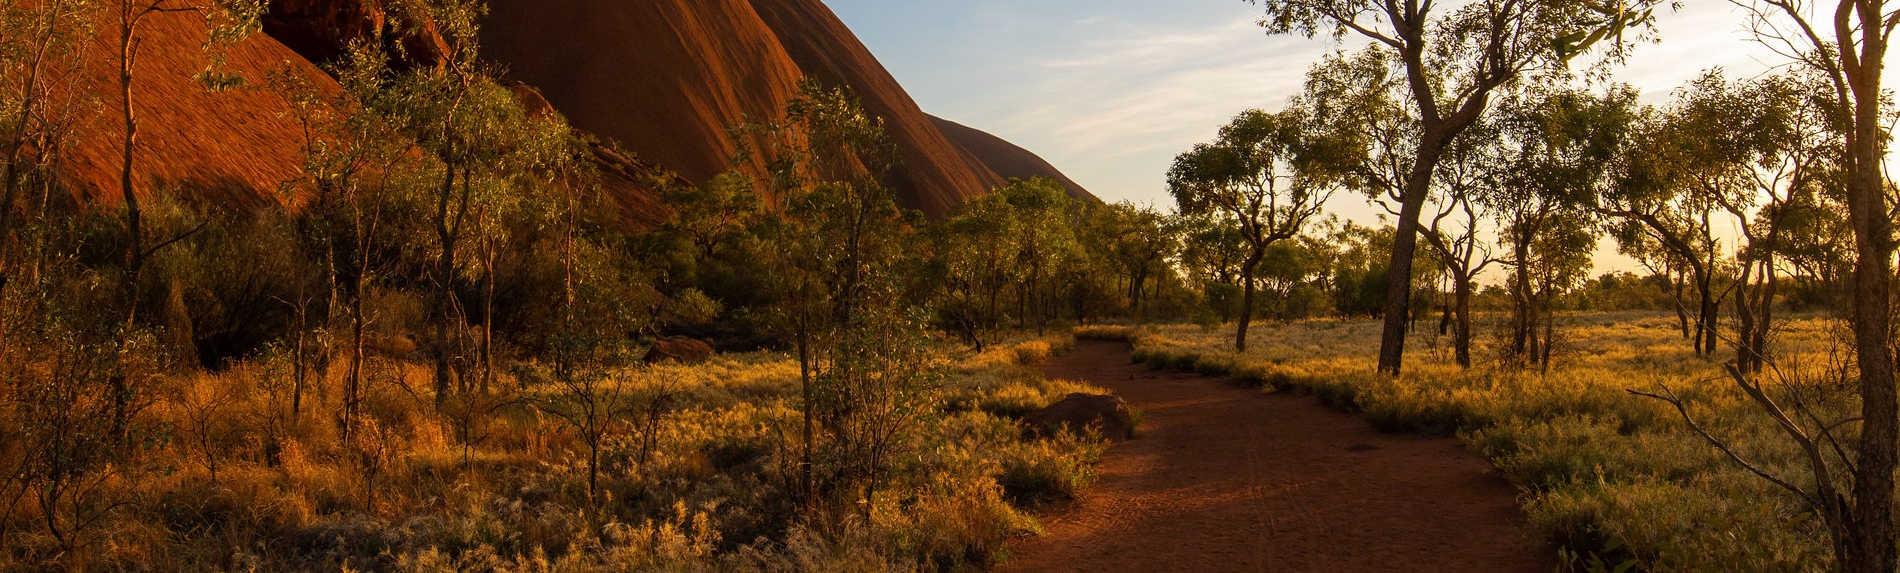 How far is the walk around Uluru?